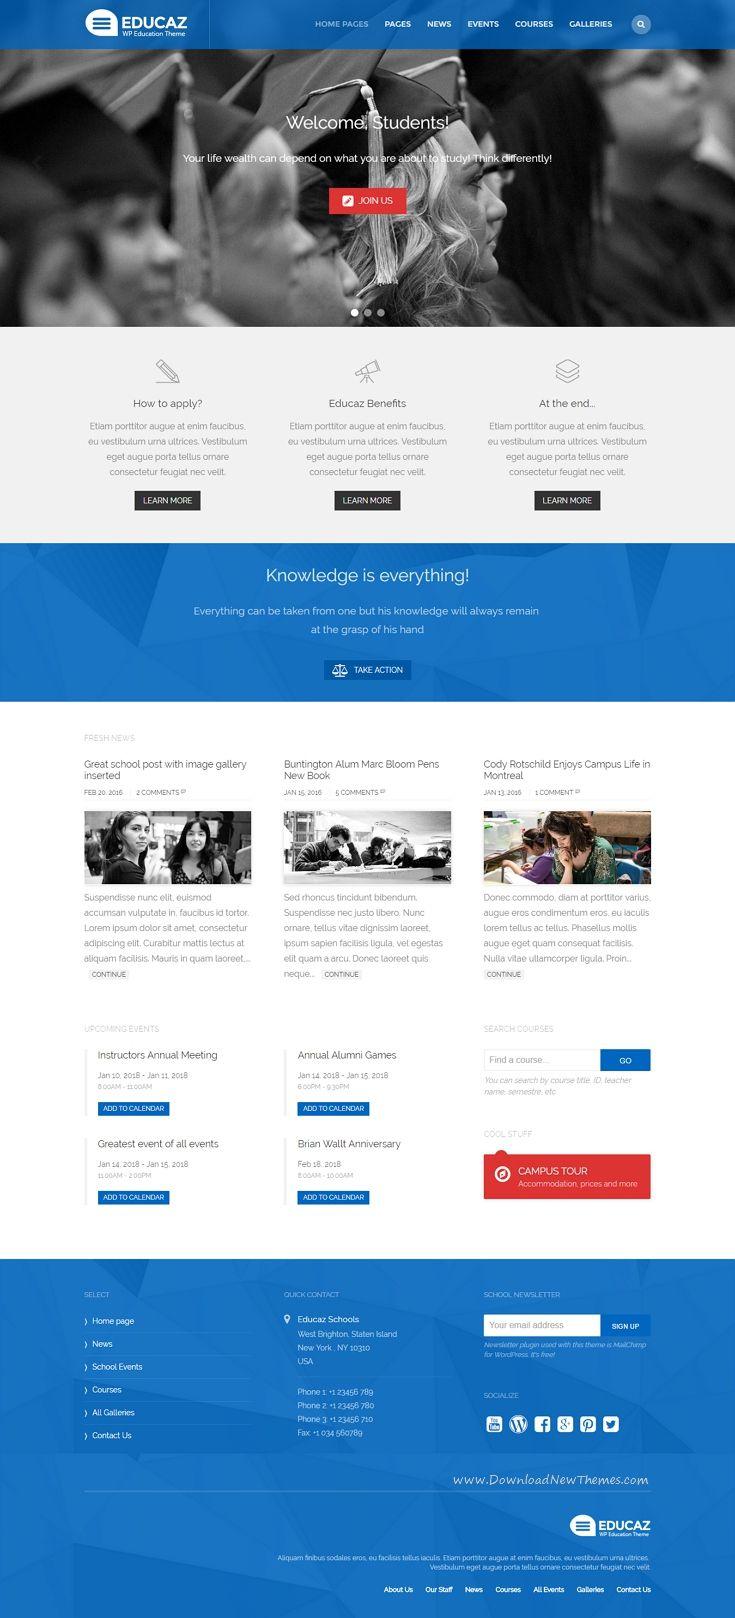 Educaz Wp Academic Education Theme University Website College Website School Website